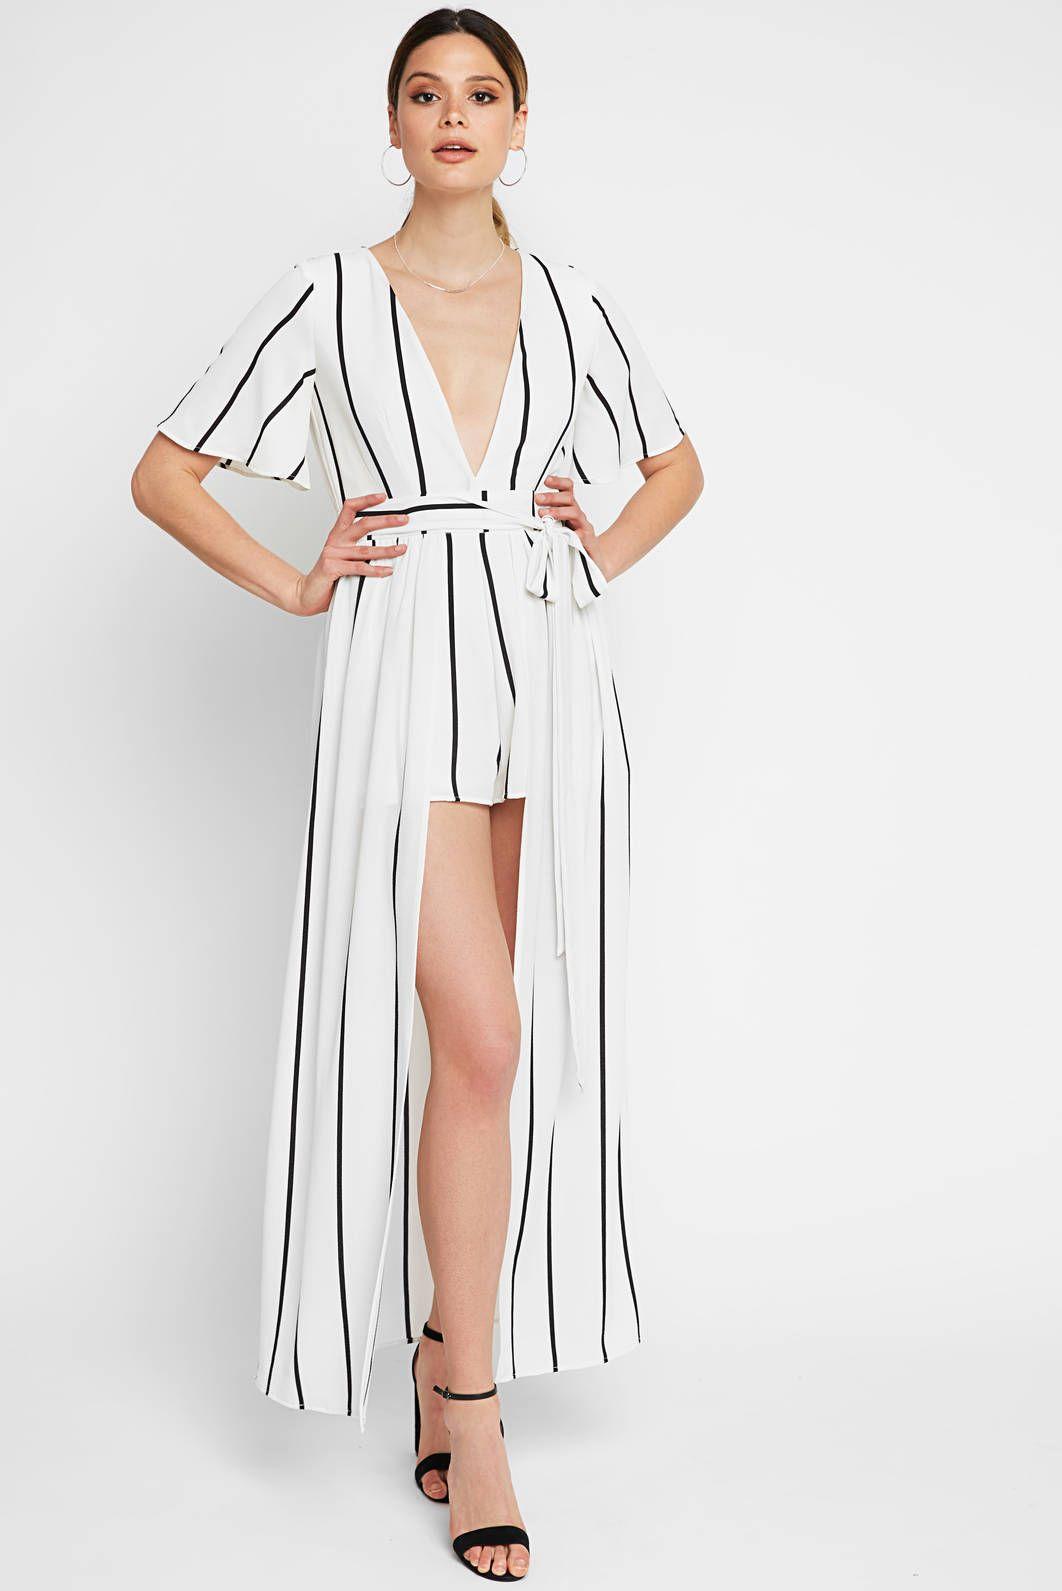 4eddd0aae7d Socialite Striped Romper Maxi Dress in WHTM